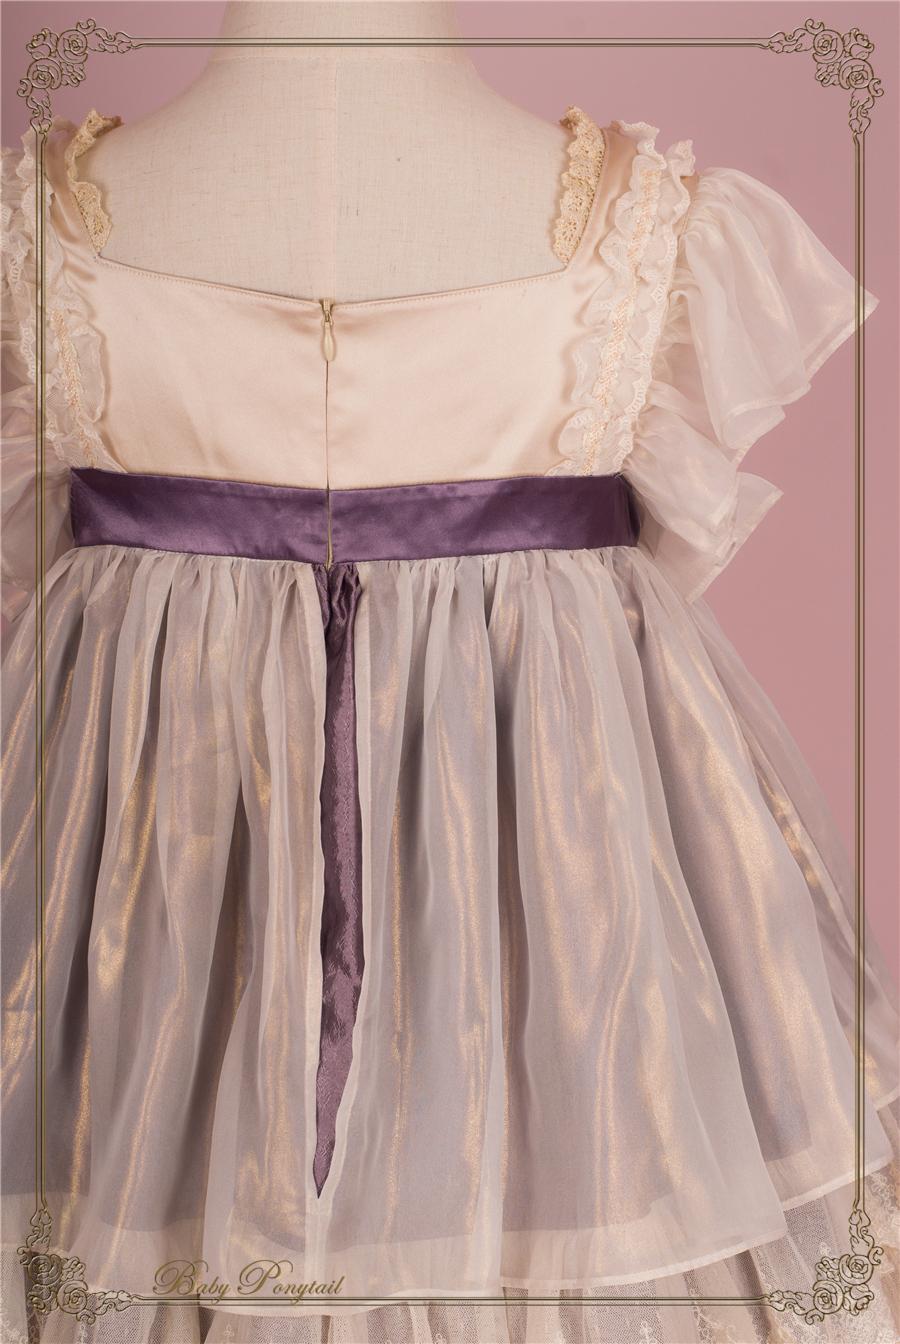 Babyponytail_Stock Photo_Present Angel_JSK Lavender_7.jpg